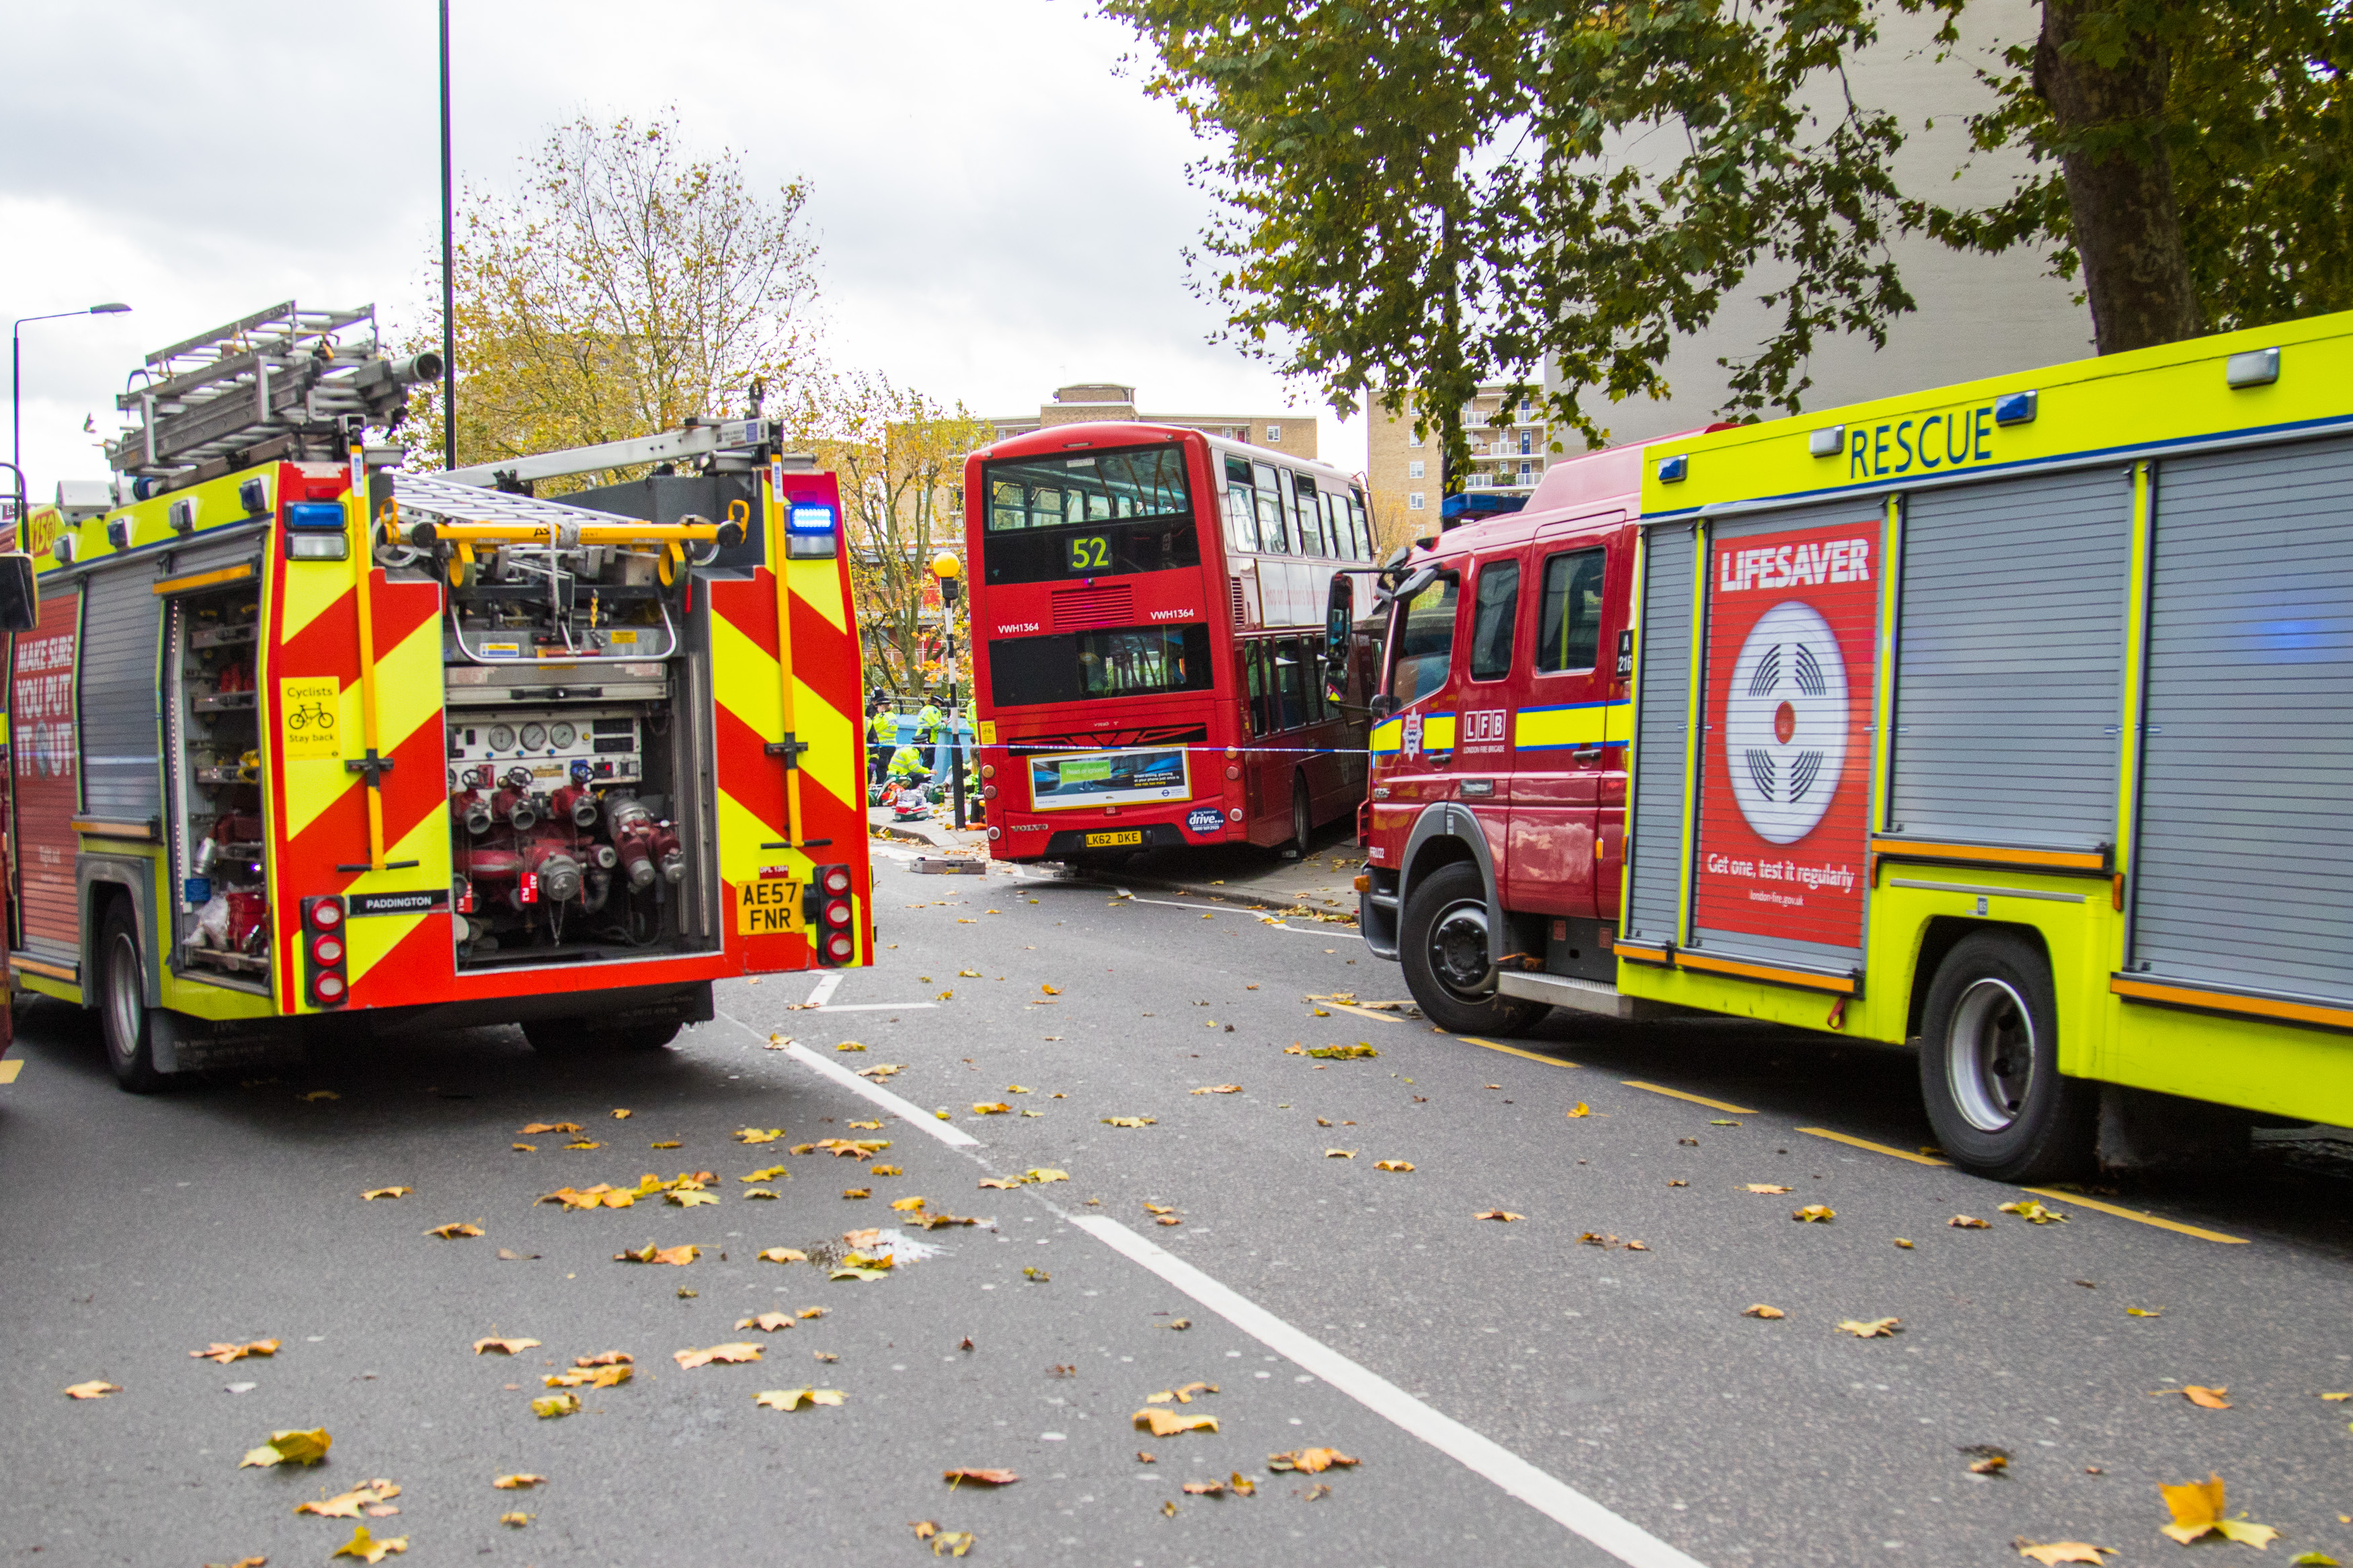 Bus Crash in London's Ladbroke Grove